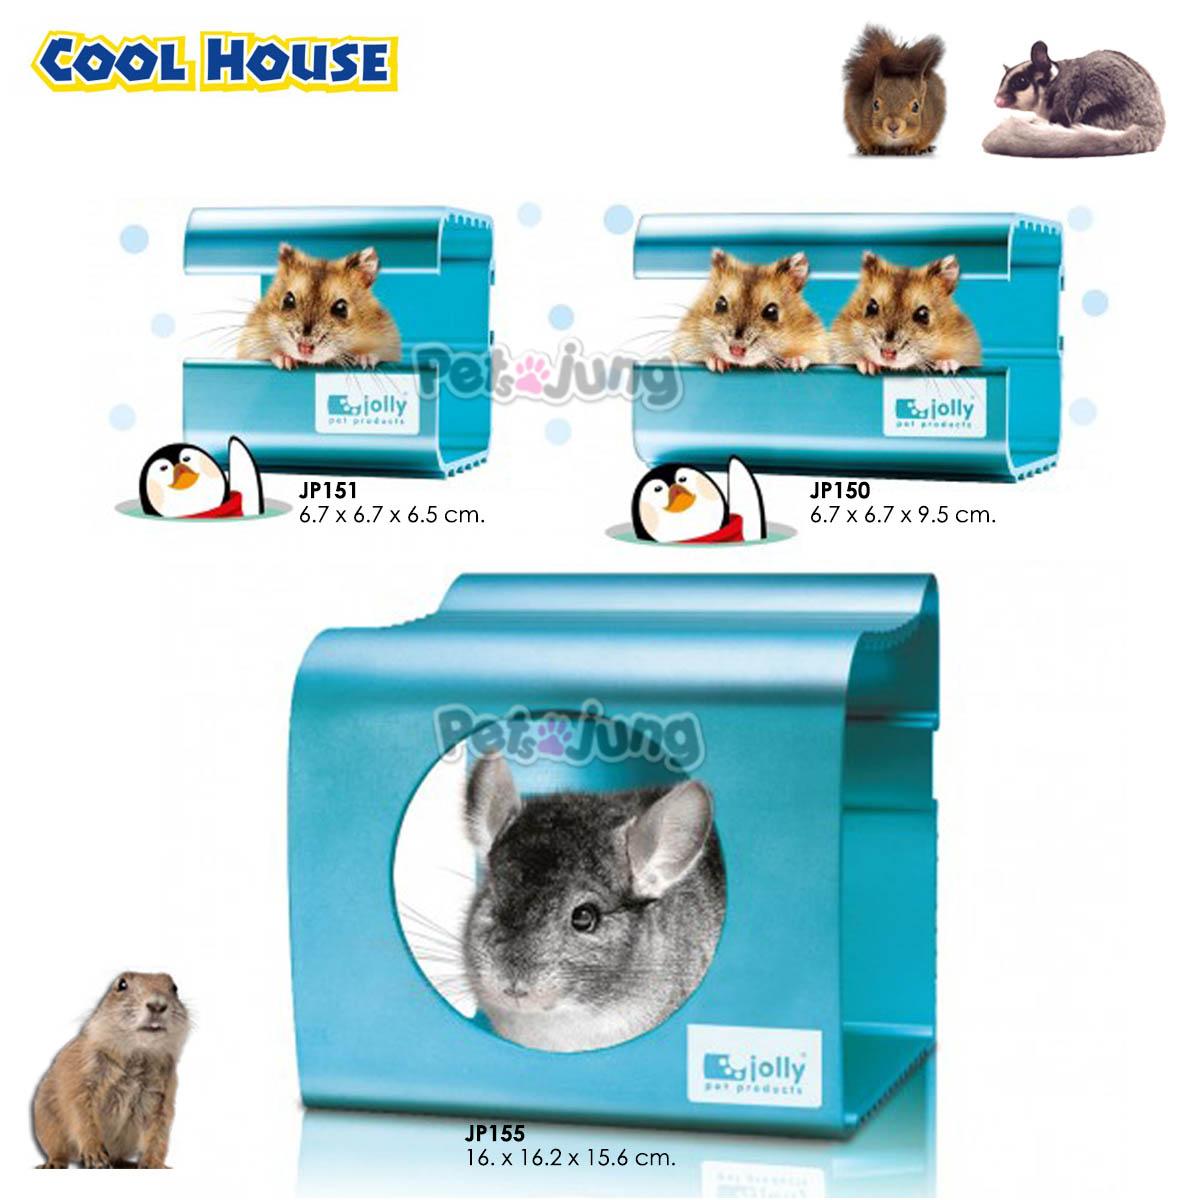 [Pre-Order] Cool House บ้านเย็น ไม่ต้องแช่เย็น (JP15/JP150/JP155)